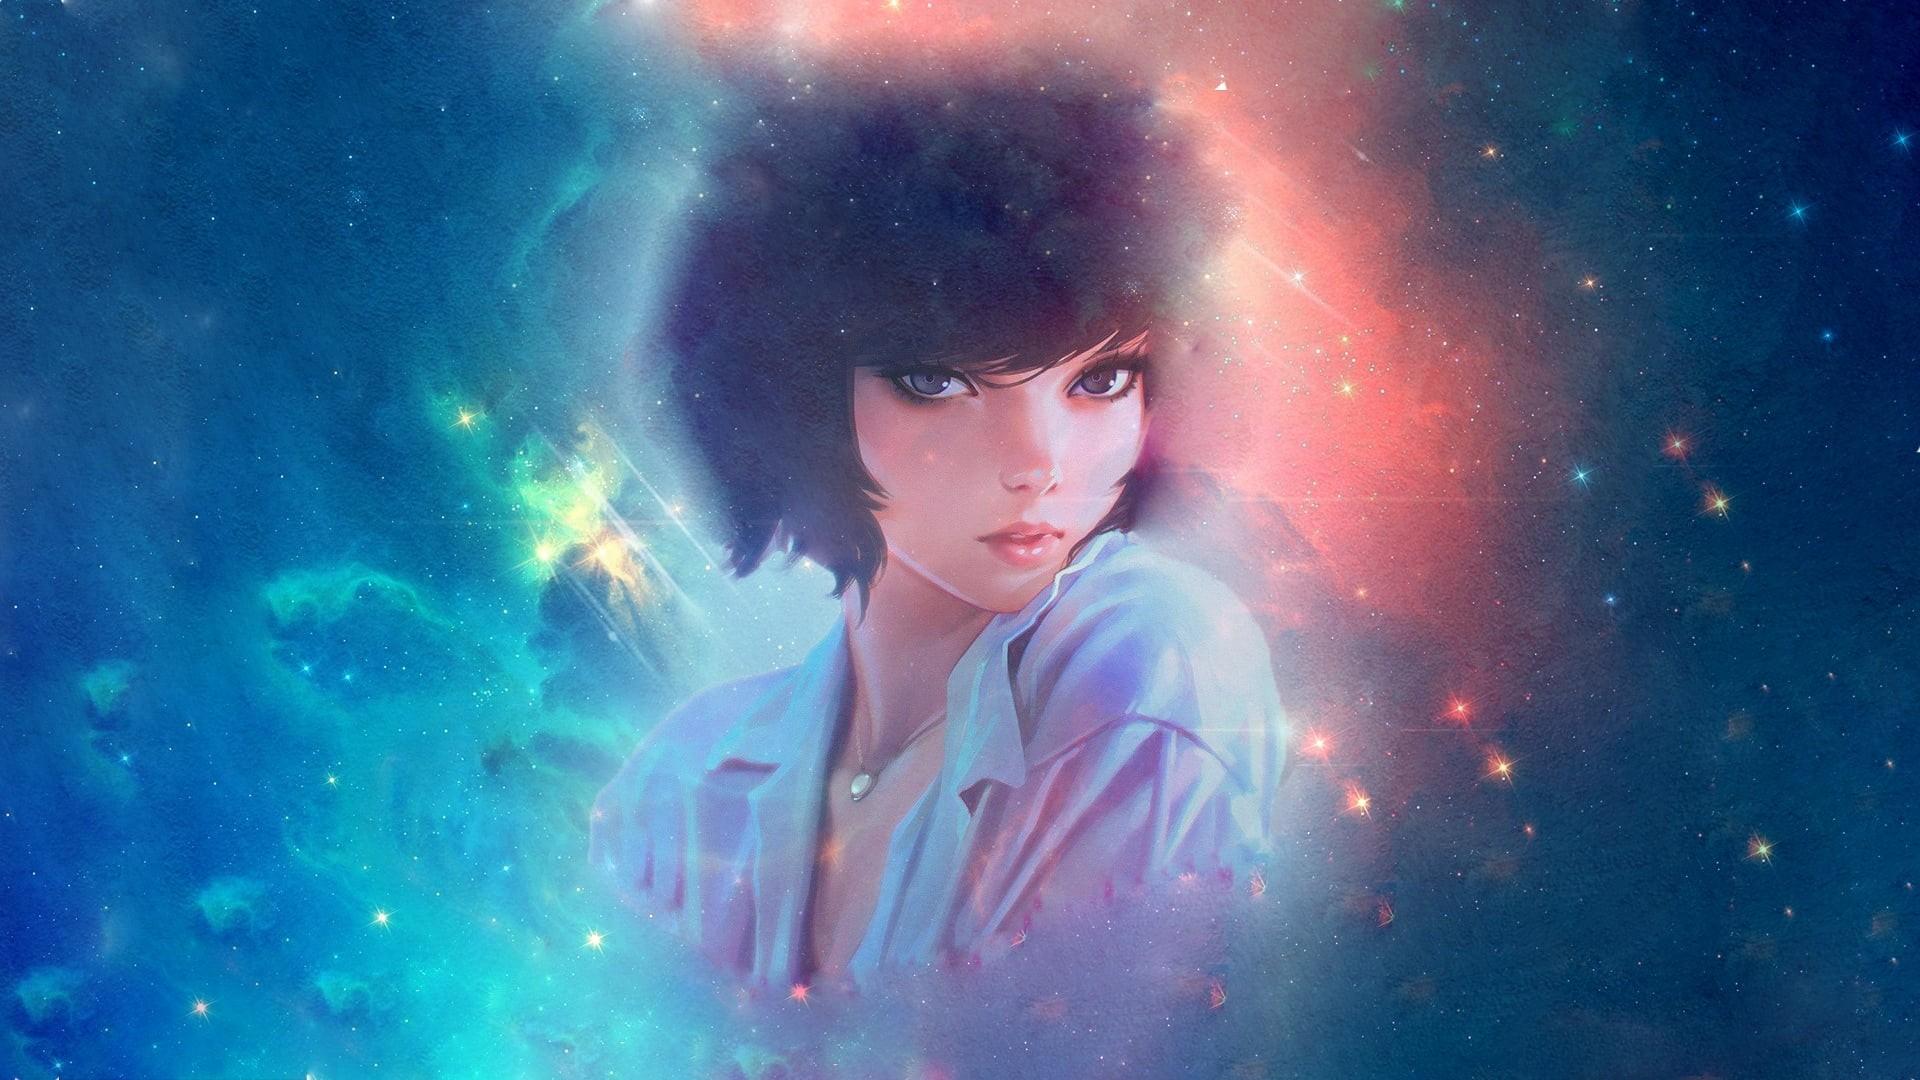 Anime Girl Short Hair Picture